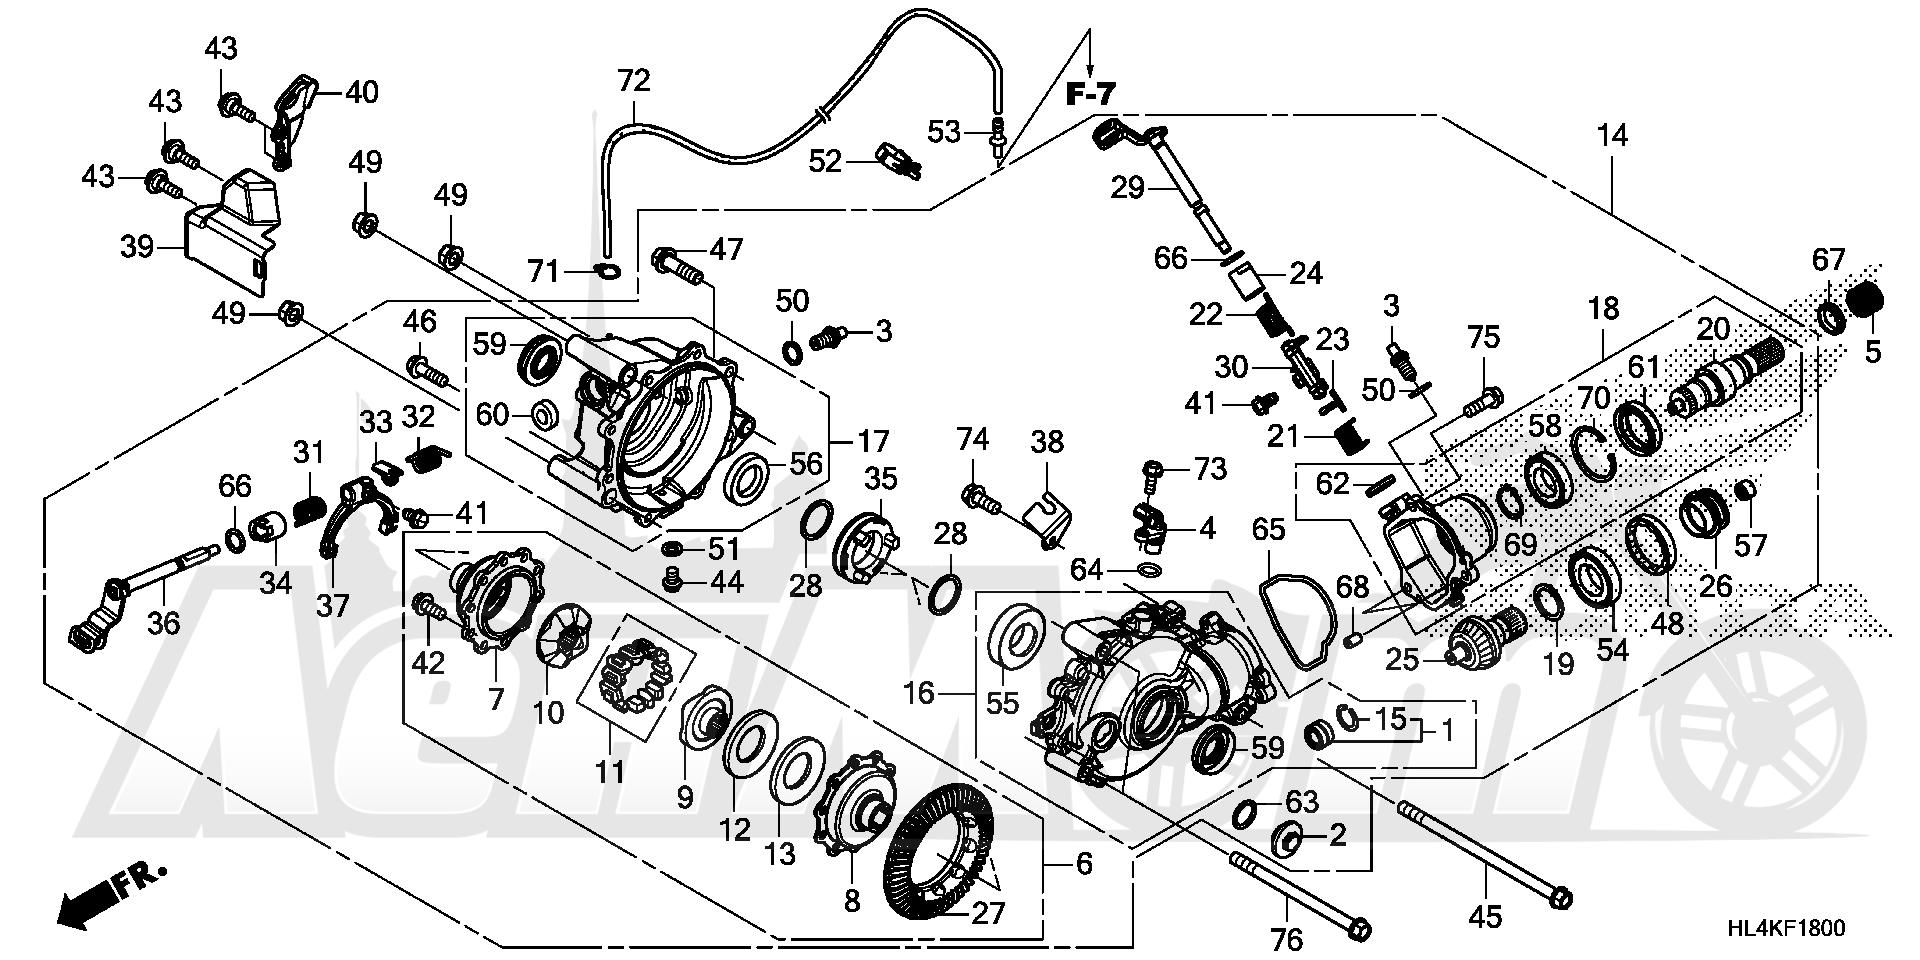 Запчасти для Квадроцикла Honda 2019 SXS1000M5D Раздел: FRONT FINAL GEAR (1) | перед FINAL шестерня (1)